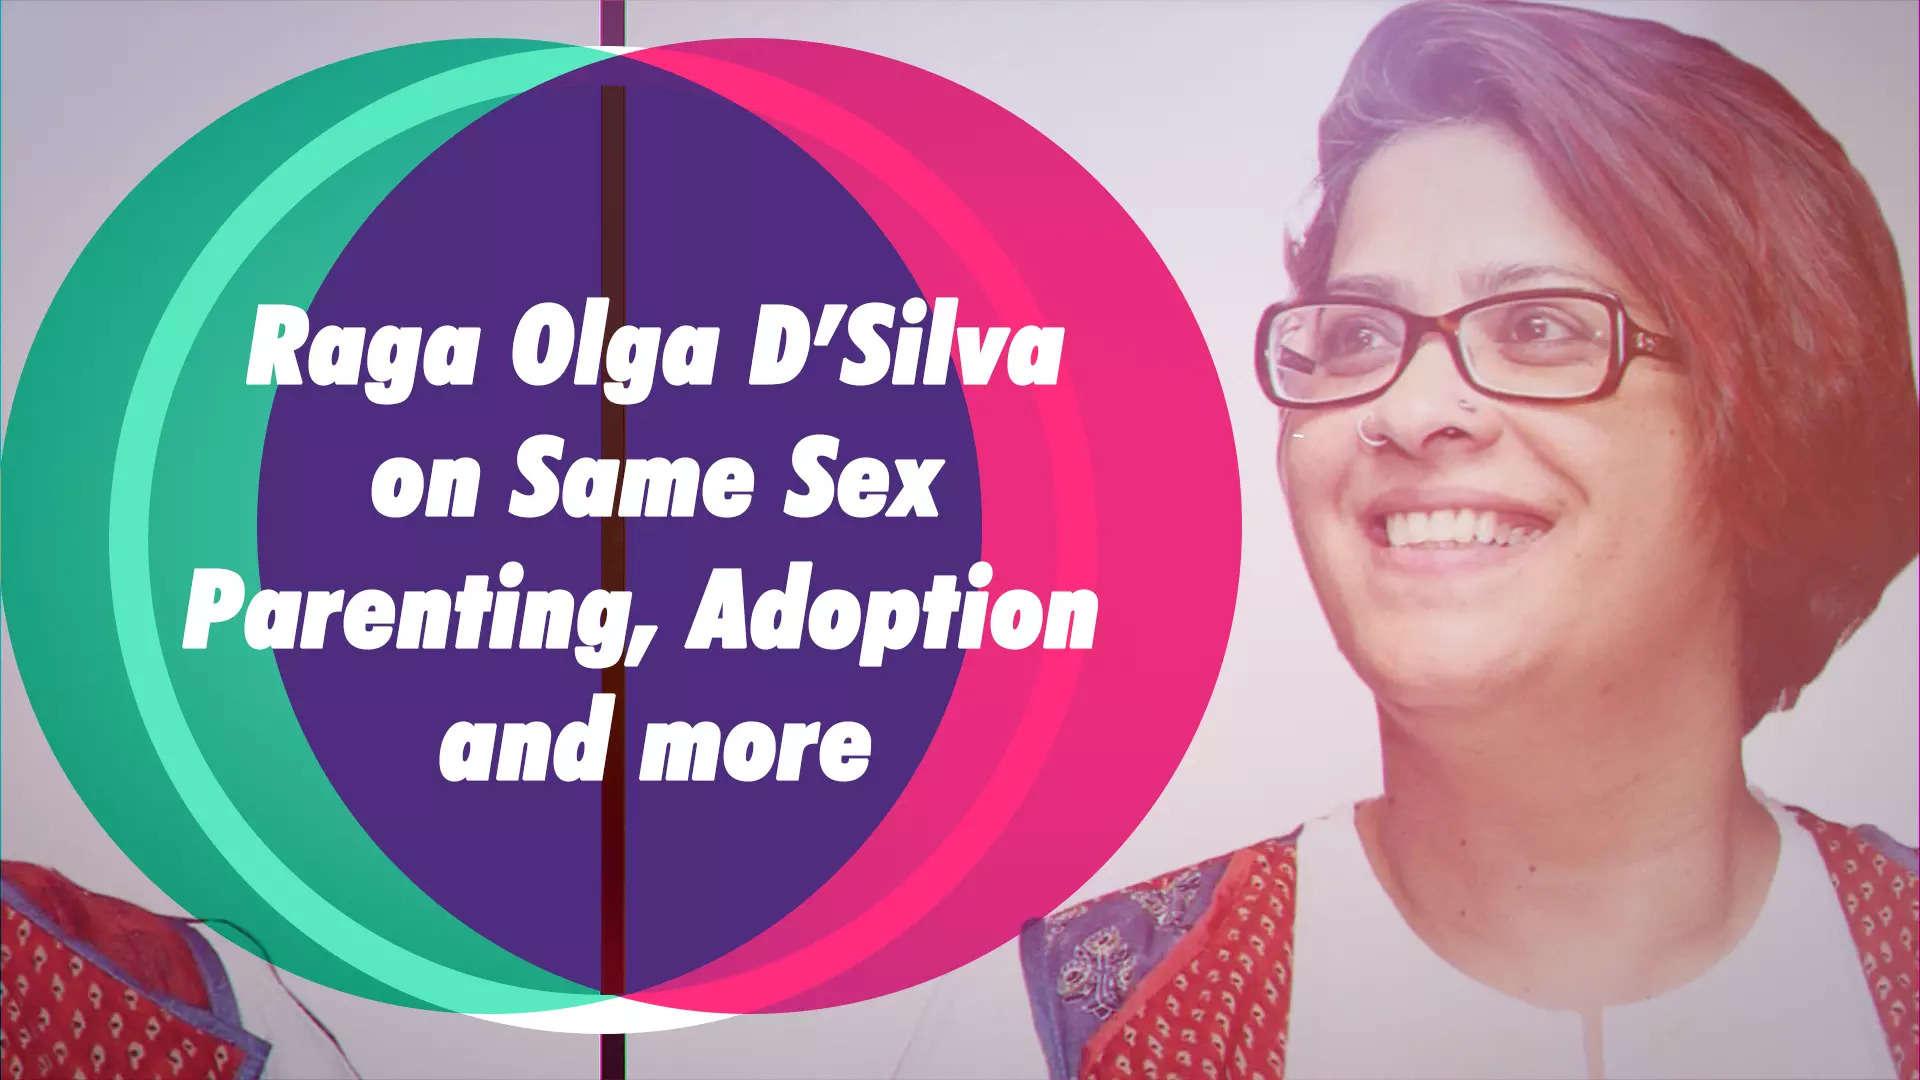 raga-olga-dsilva-on-same-sex-parenting-adoption-and-more